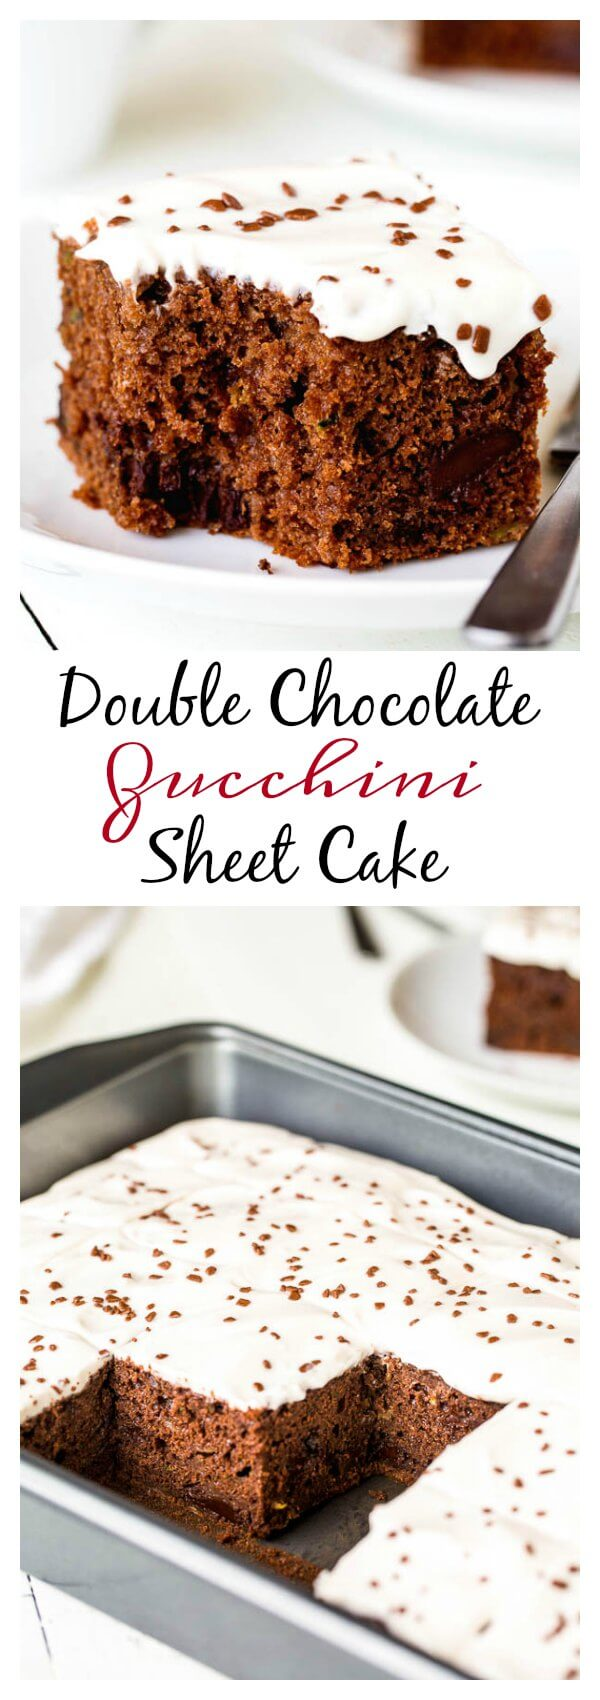 Double Chocolate Zucchini Sheet Cake